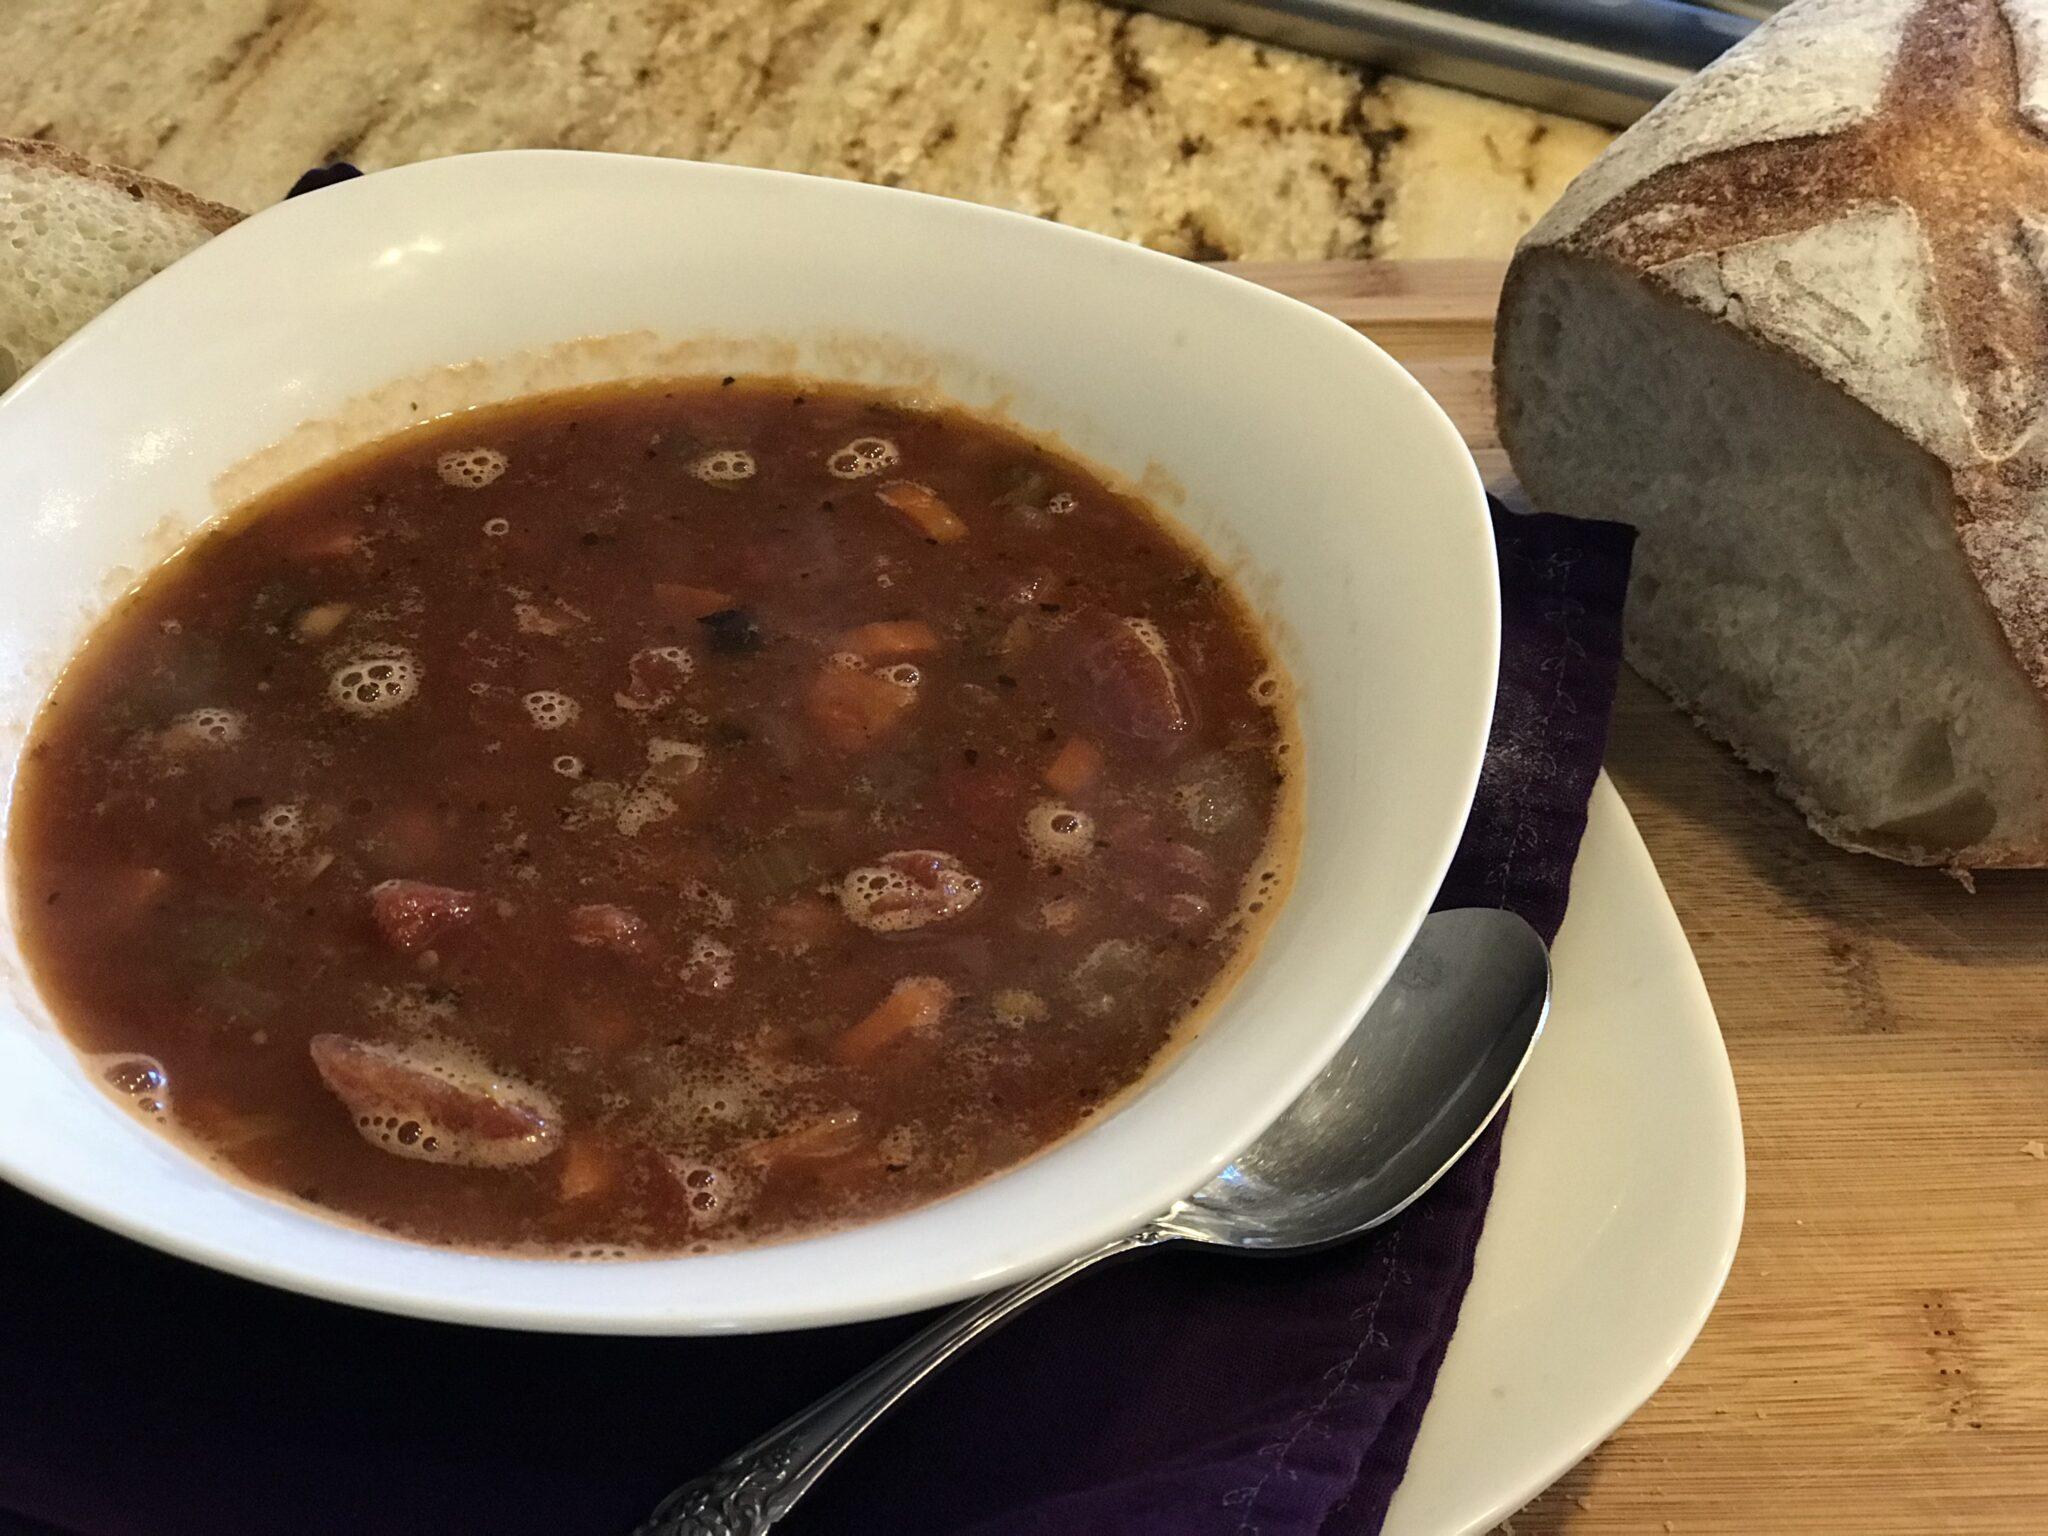 6 Bean, 8 Bean, 10 Bean Soup For All You Beancounters